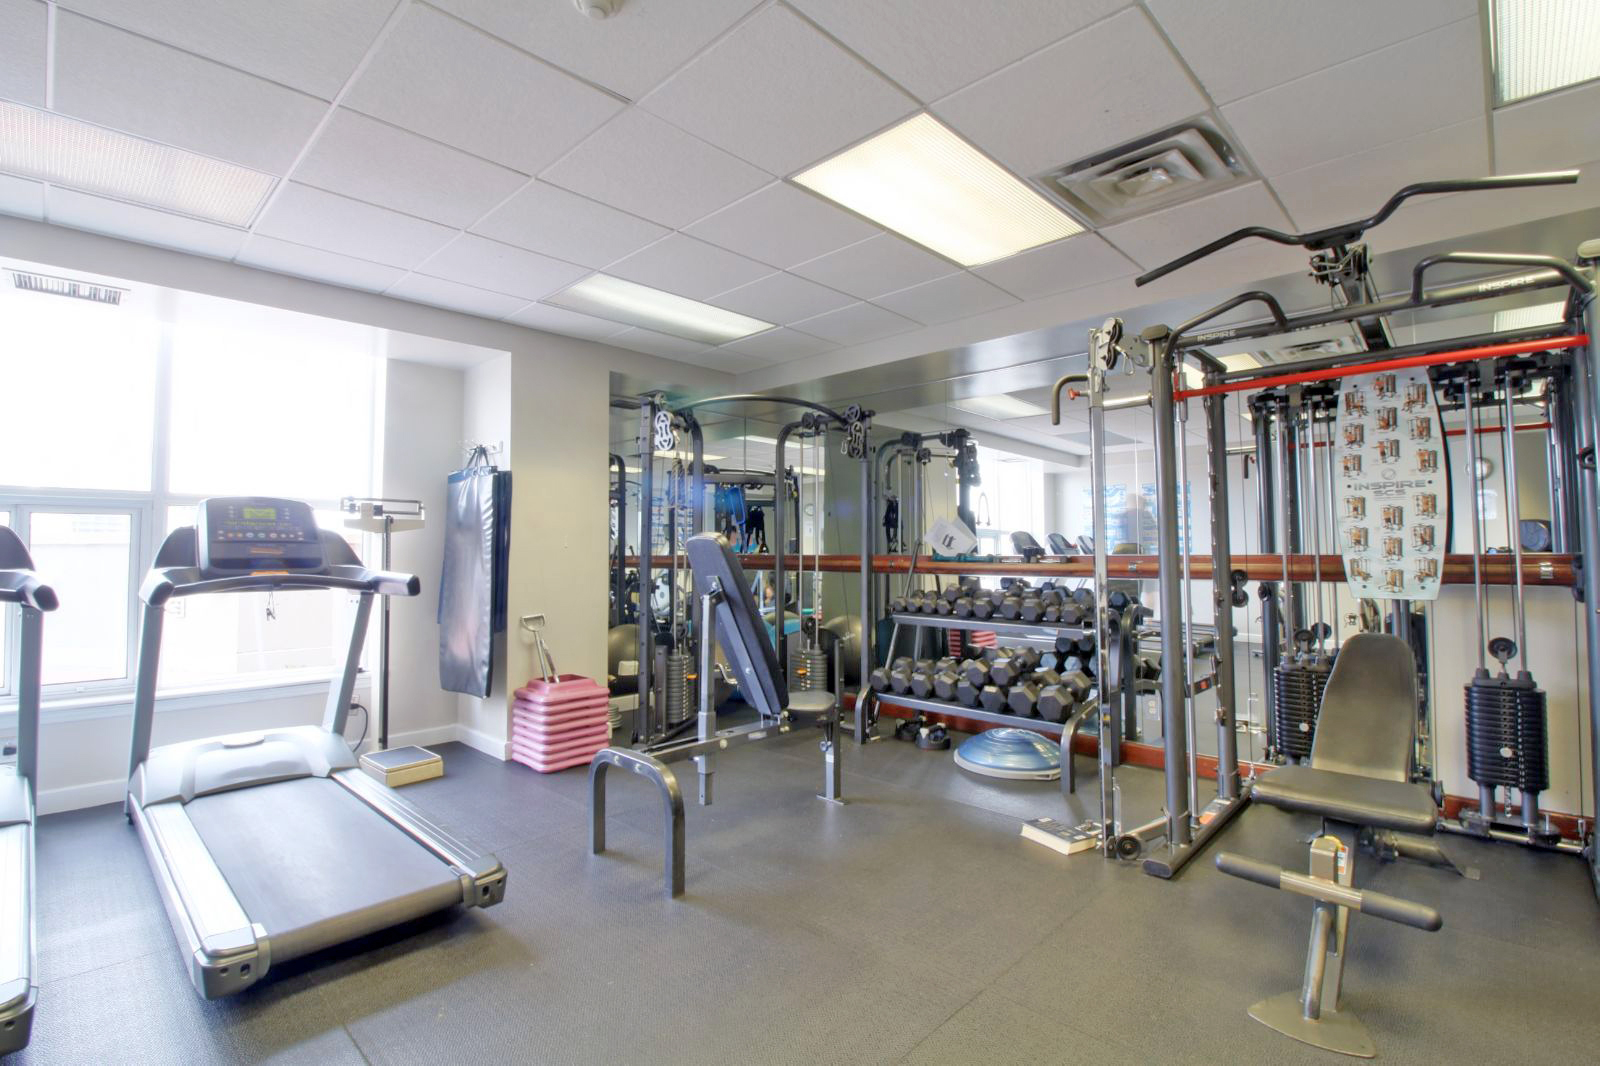 08 - Amenities - Gym.jpg